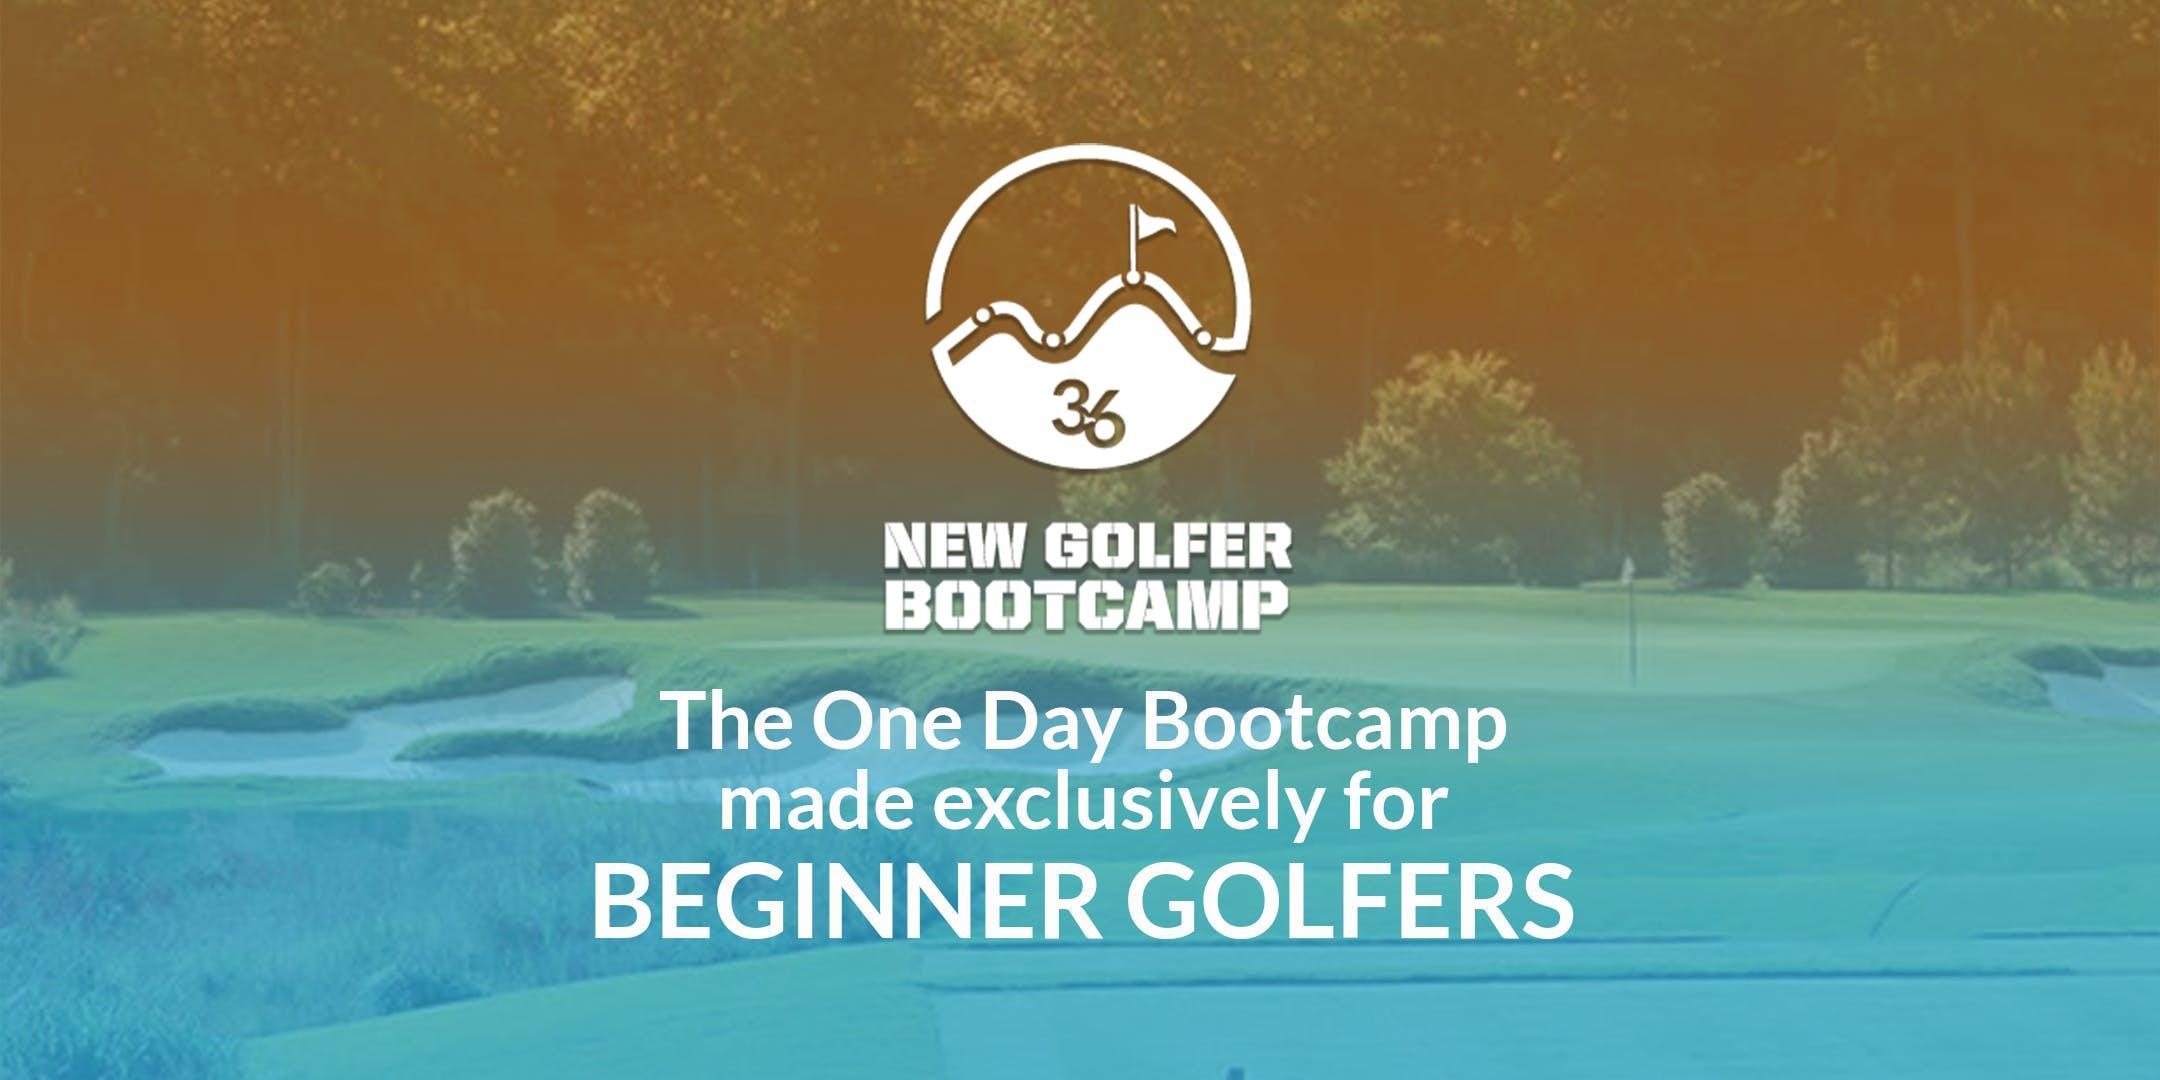 New Golfer Bootcamp @ Keith Hills Golf Club (November 12th 2019)